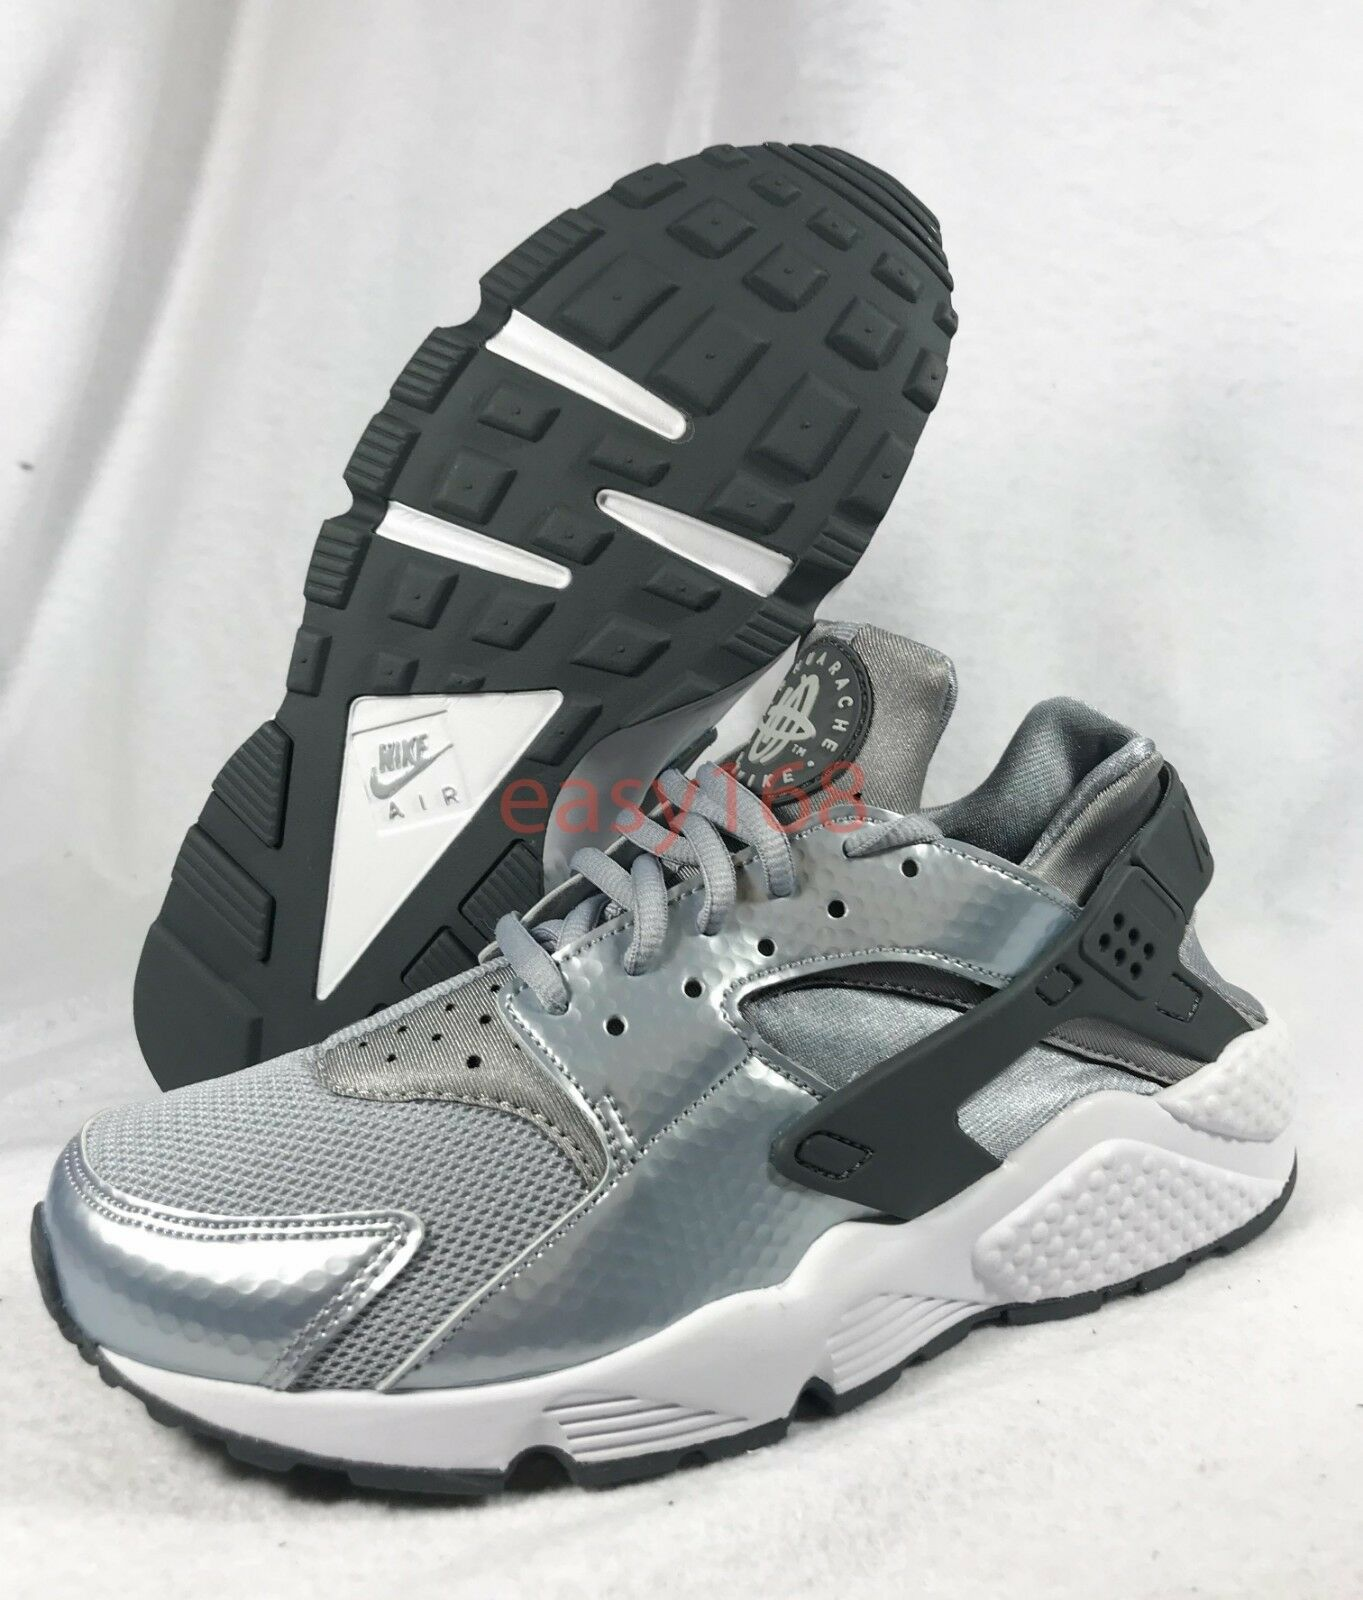 New Nike Air Huarache Sz 7.5 WMN's 38.5 Running shoes 634835 Silver Vapor Run